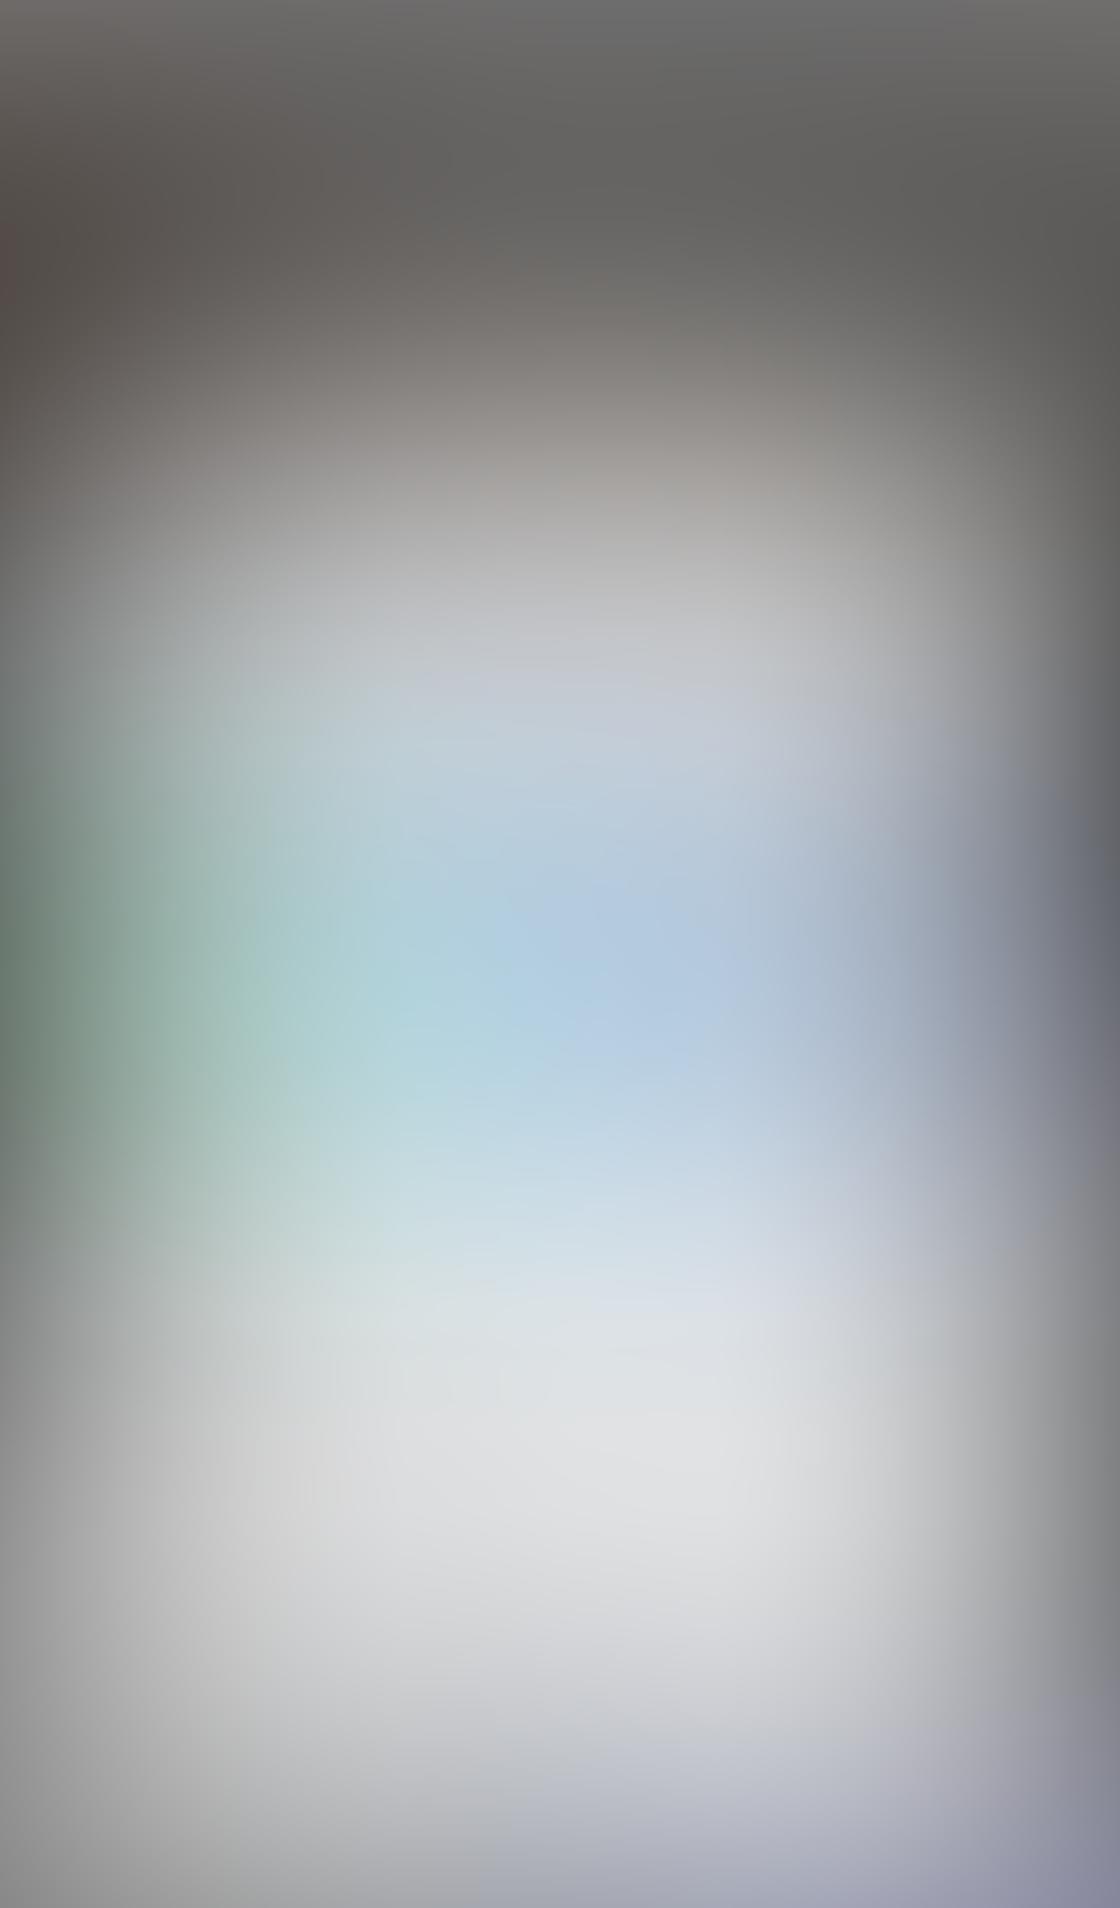 Backup iPhone Photos 4